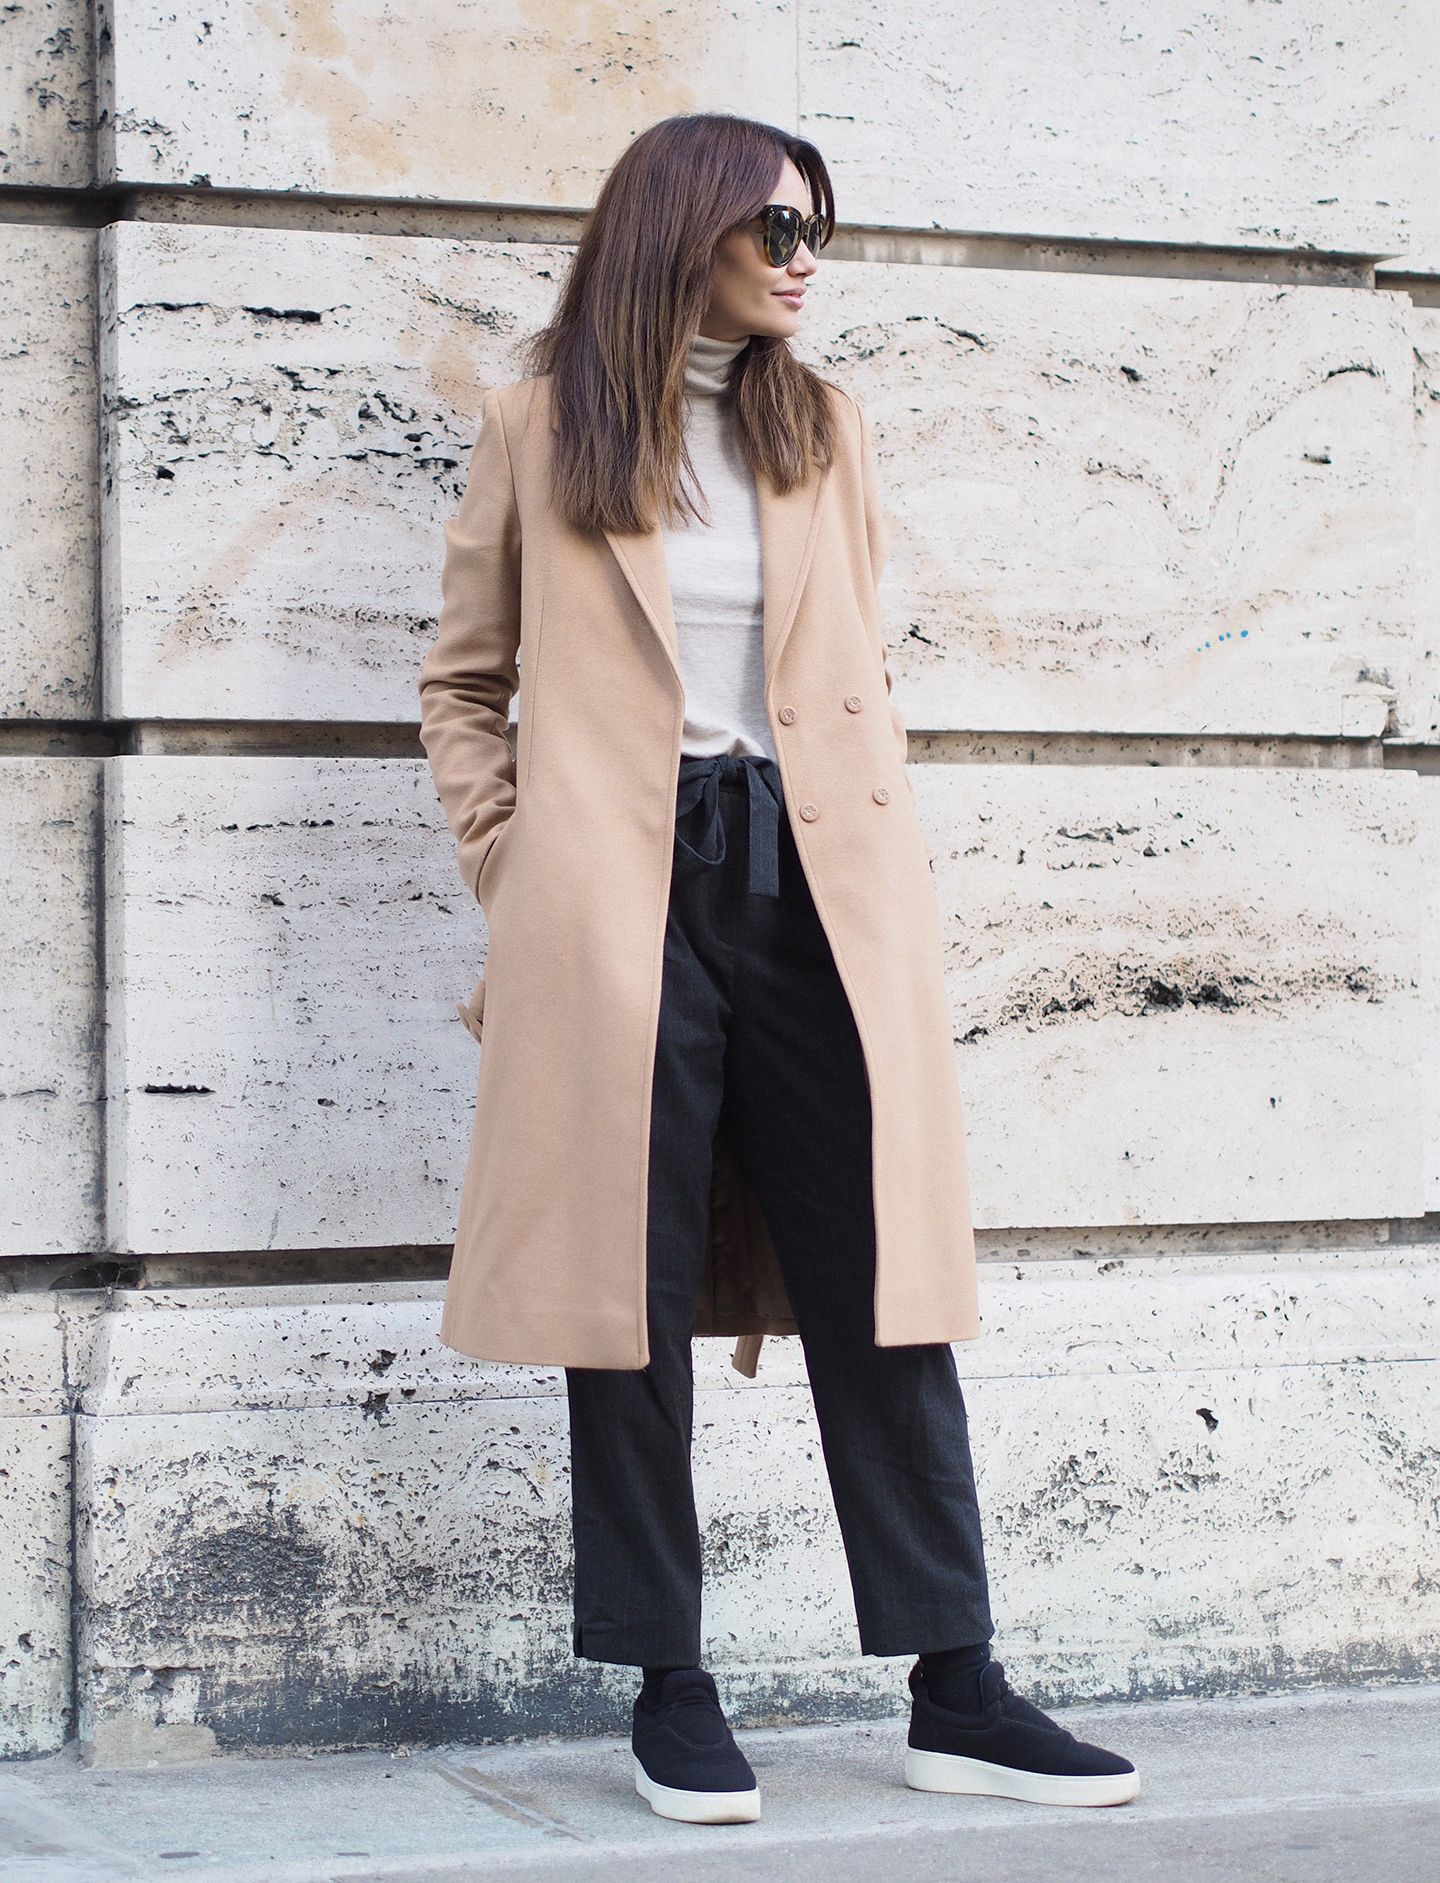 Camel autumn days #style #outfit #designersremix #camel #coat #celine #céline #byfunda #fundachristophersen